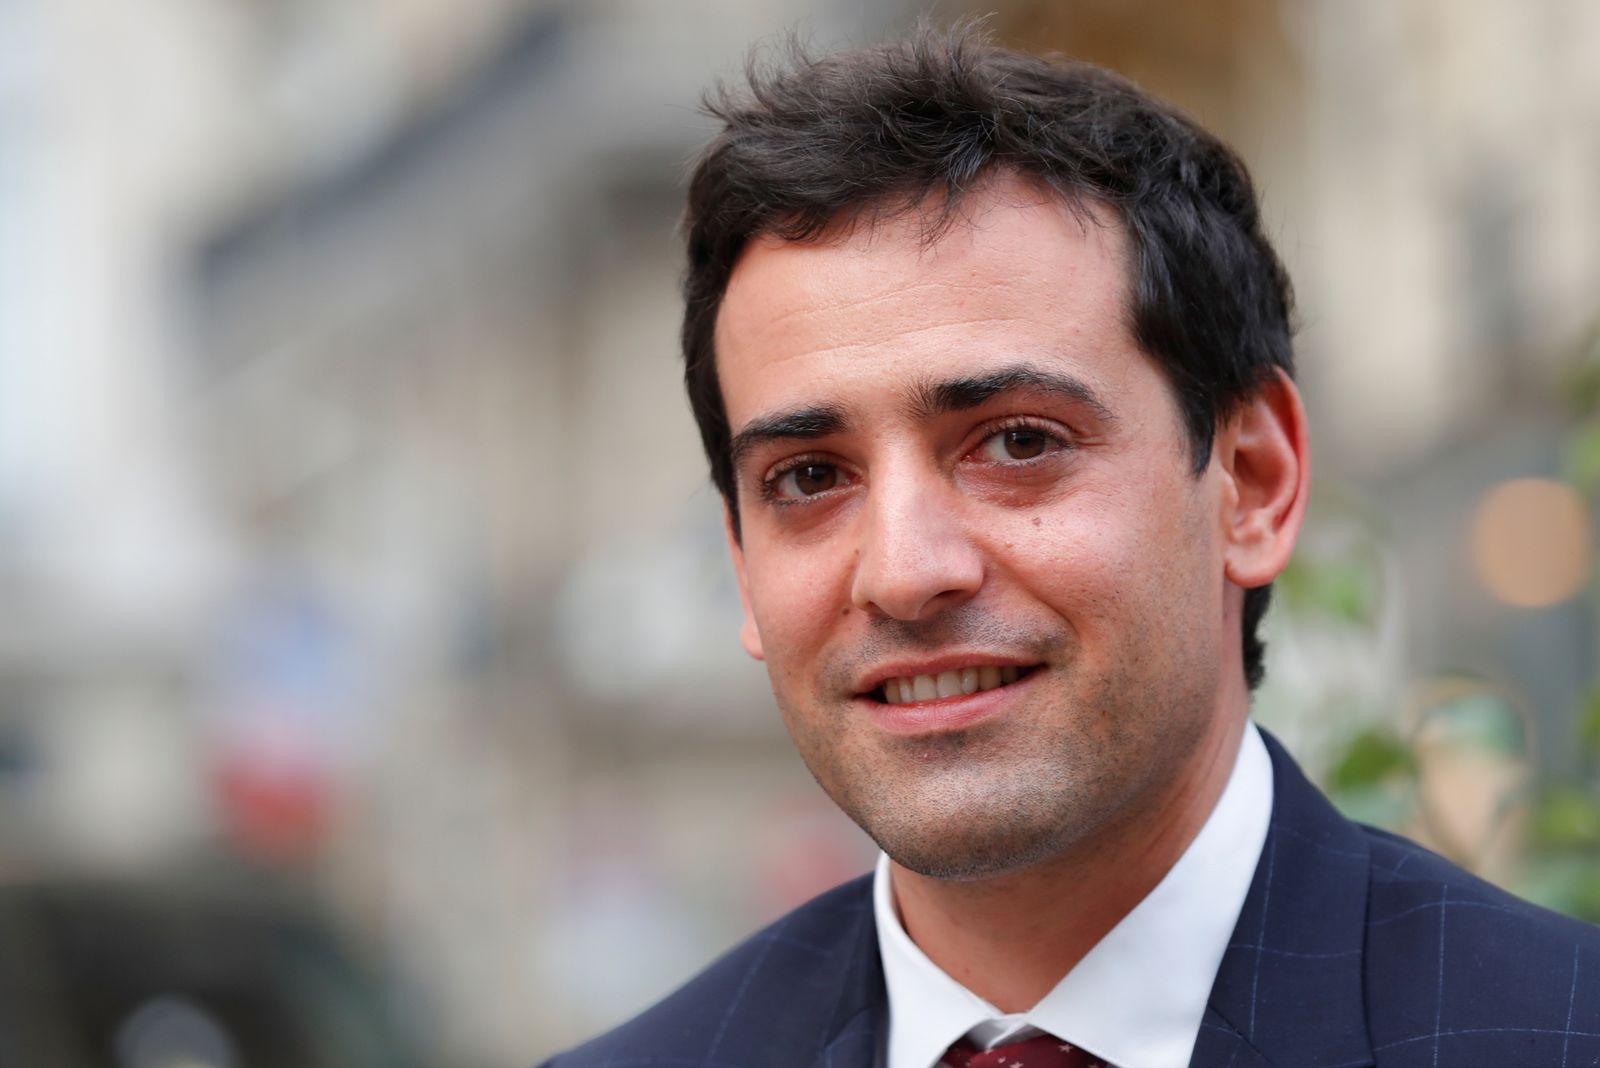 Stéphane Séjourné